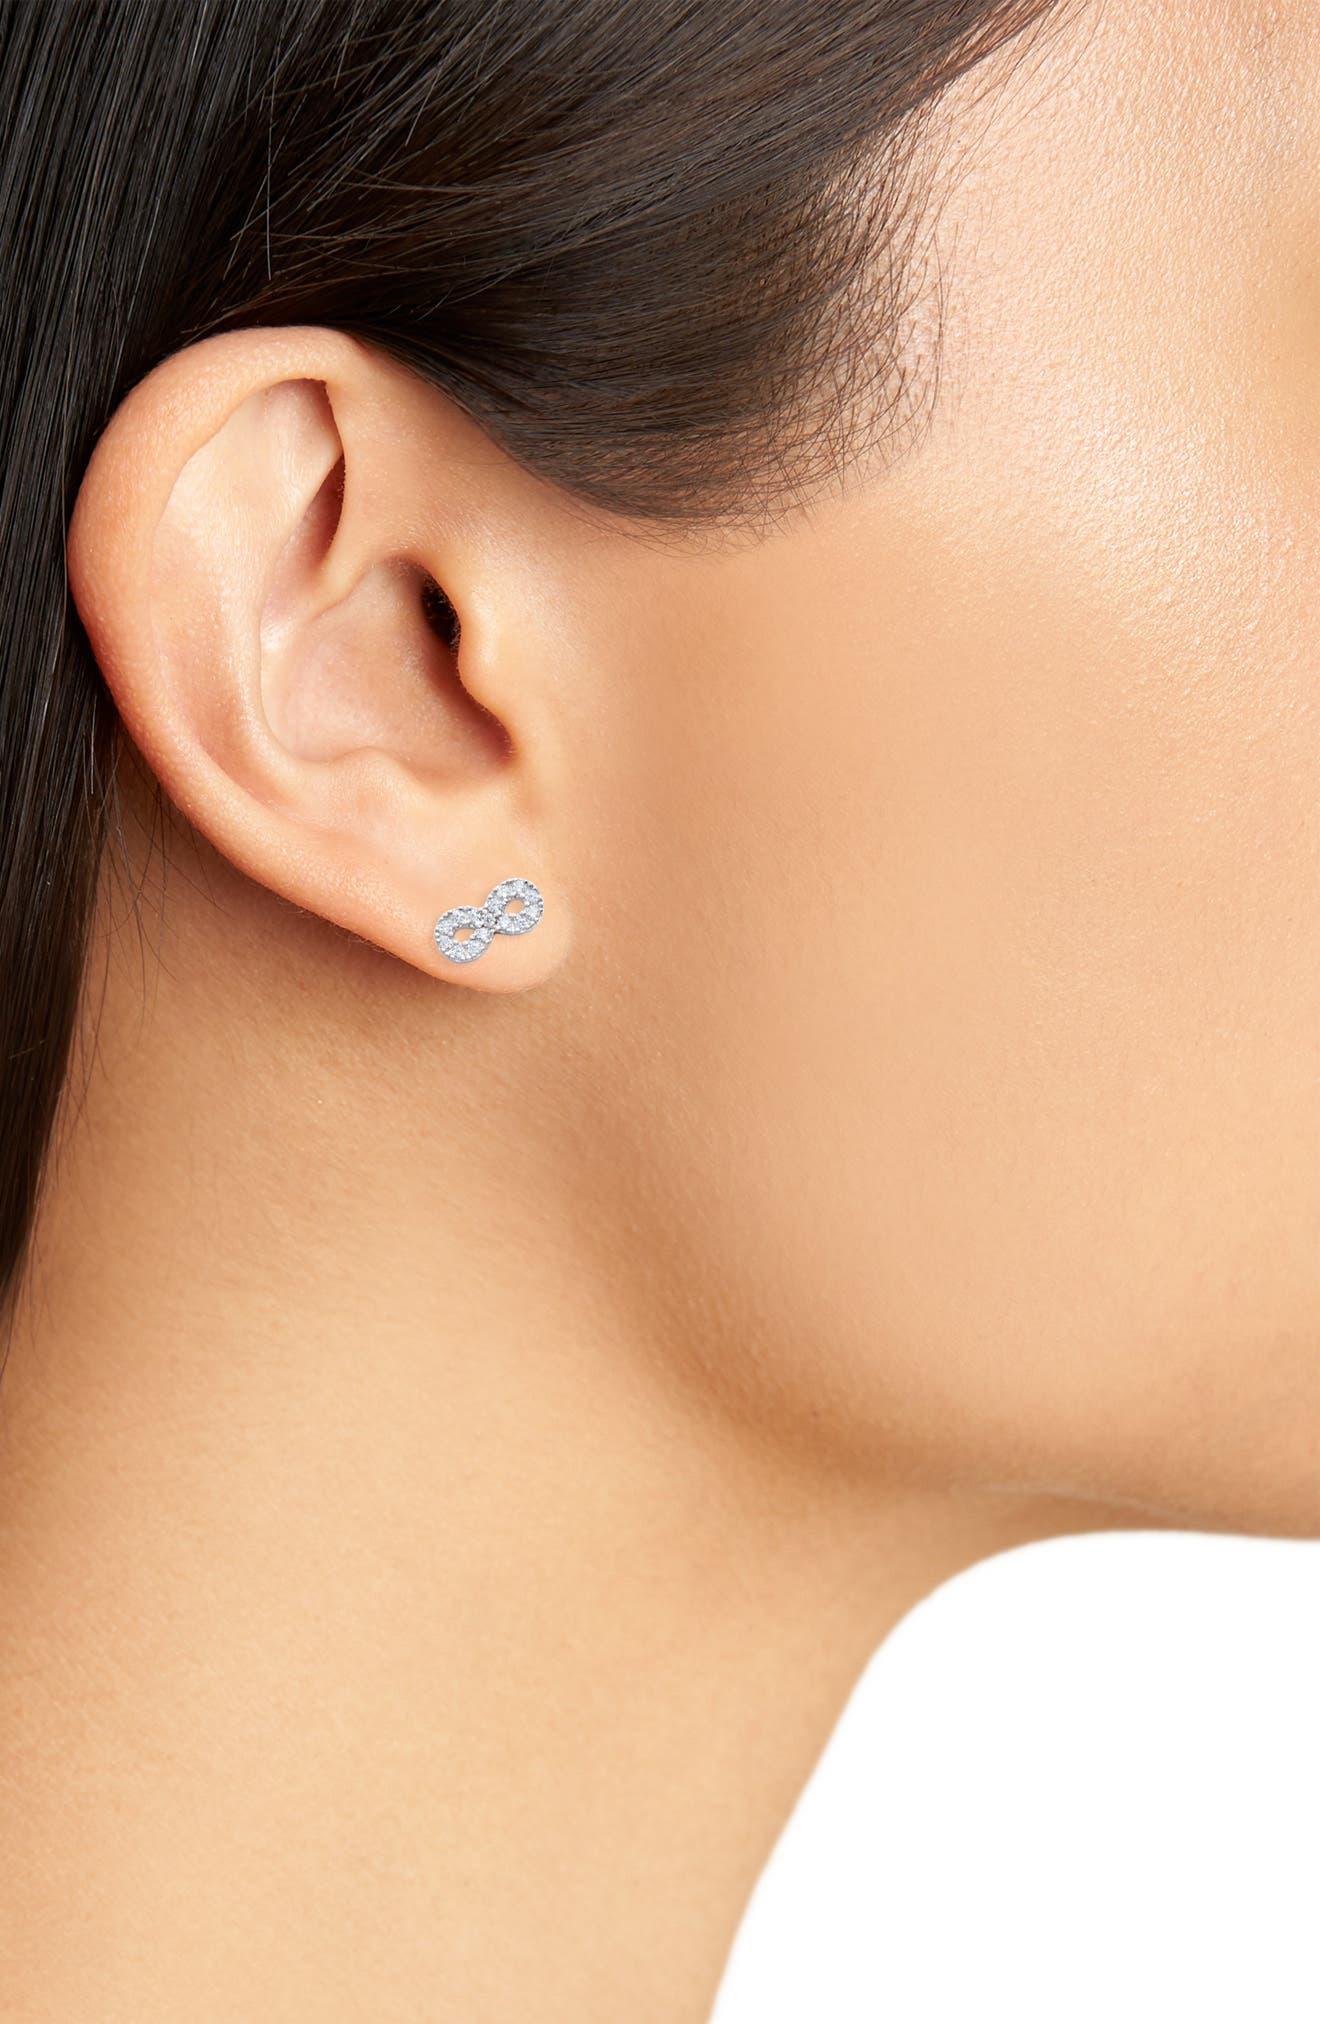 Infinity Stud Earrings,                             Alternate thumbnail 2, color,                             040